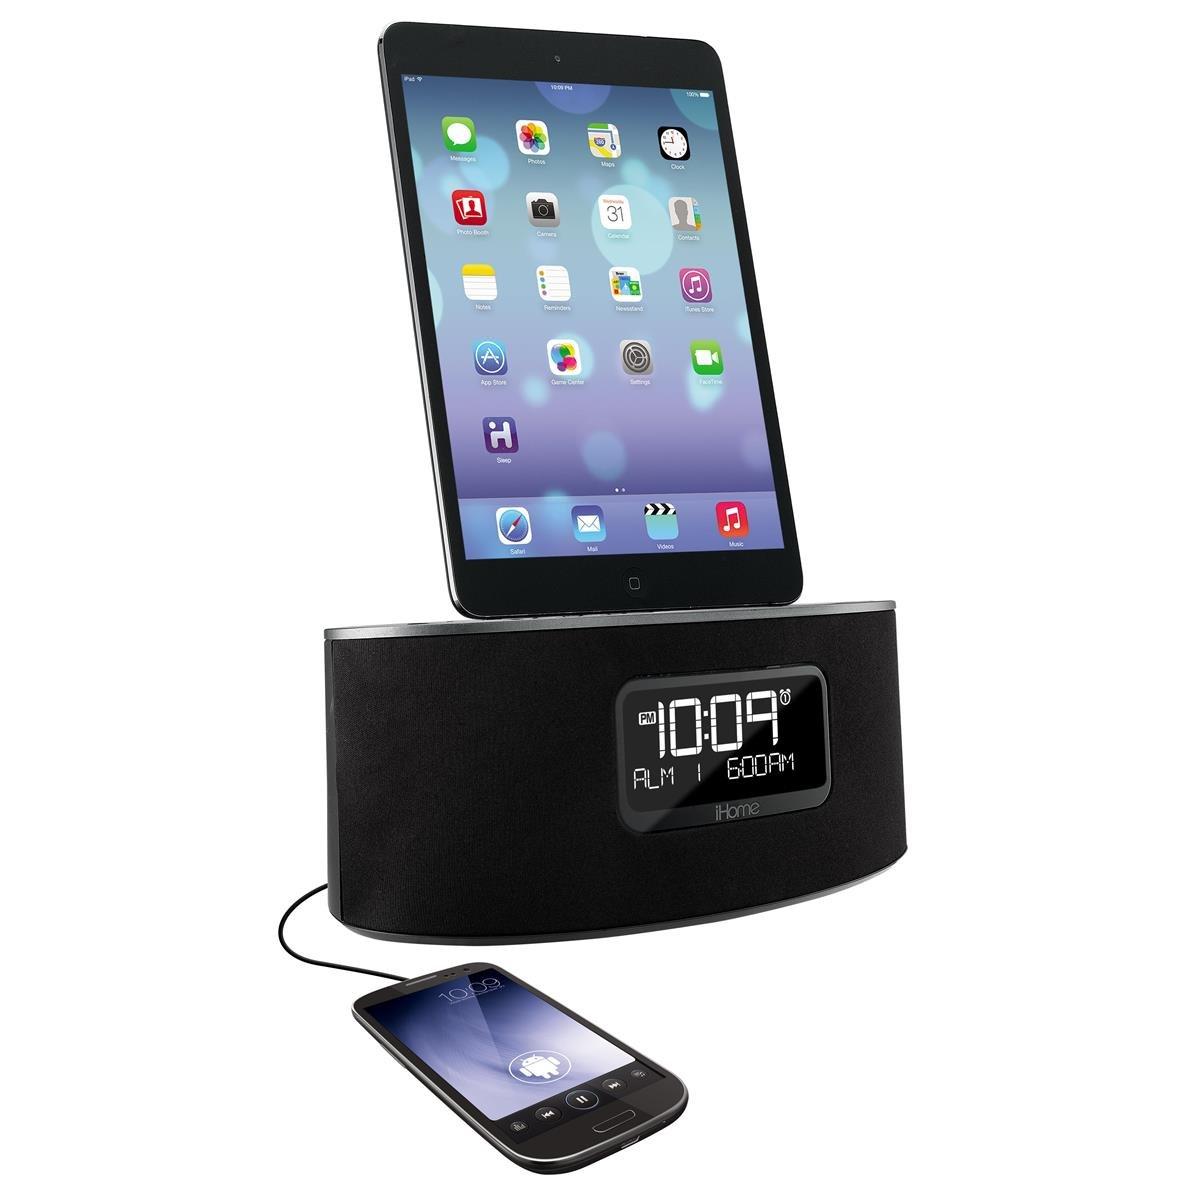 ihome idl46 docking speaker with lightning connector fm clock alarm chargenplay. Black Bedroom Furniture Sets. Home Design Ideas